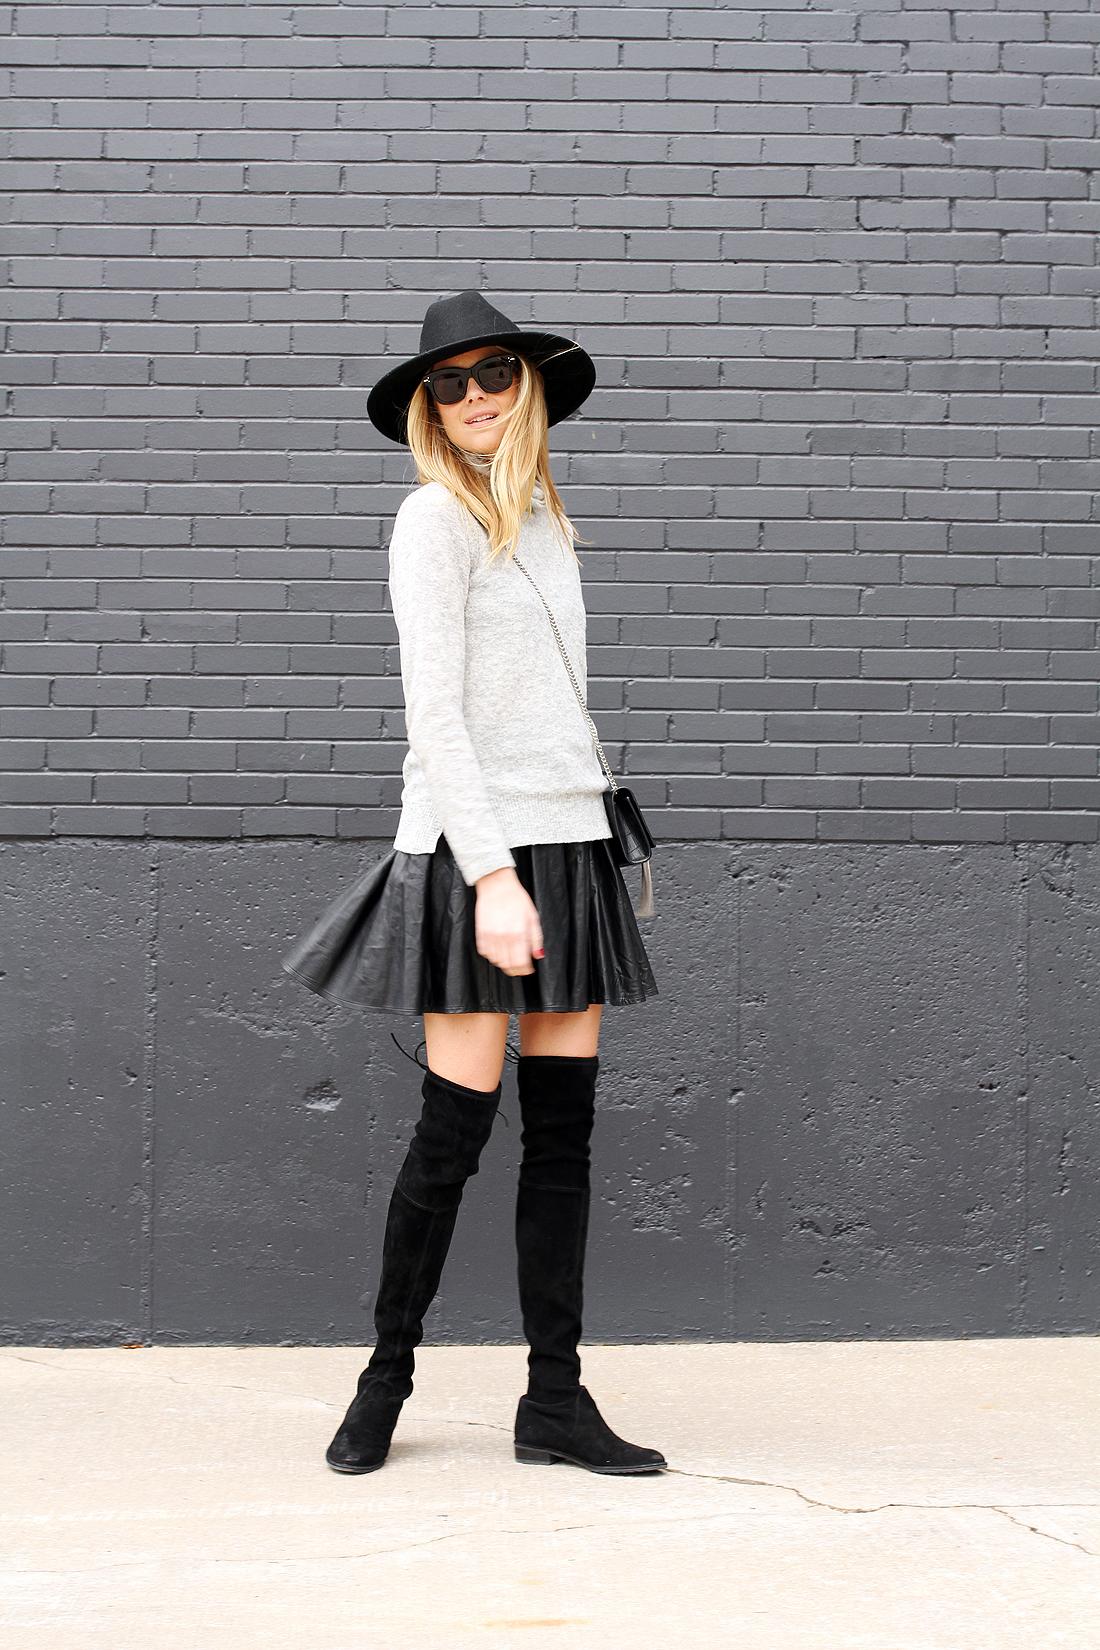 fashion-jackson-grey-sweater-black-pleated-skirt-stuart-weitzman-black-otk-boots-black-wool-hat